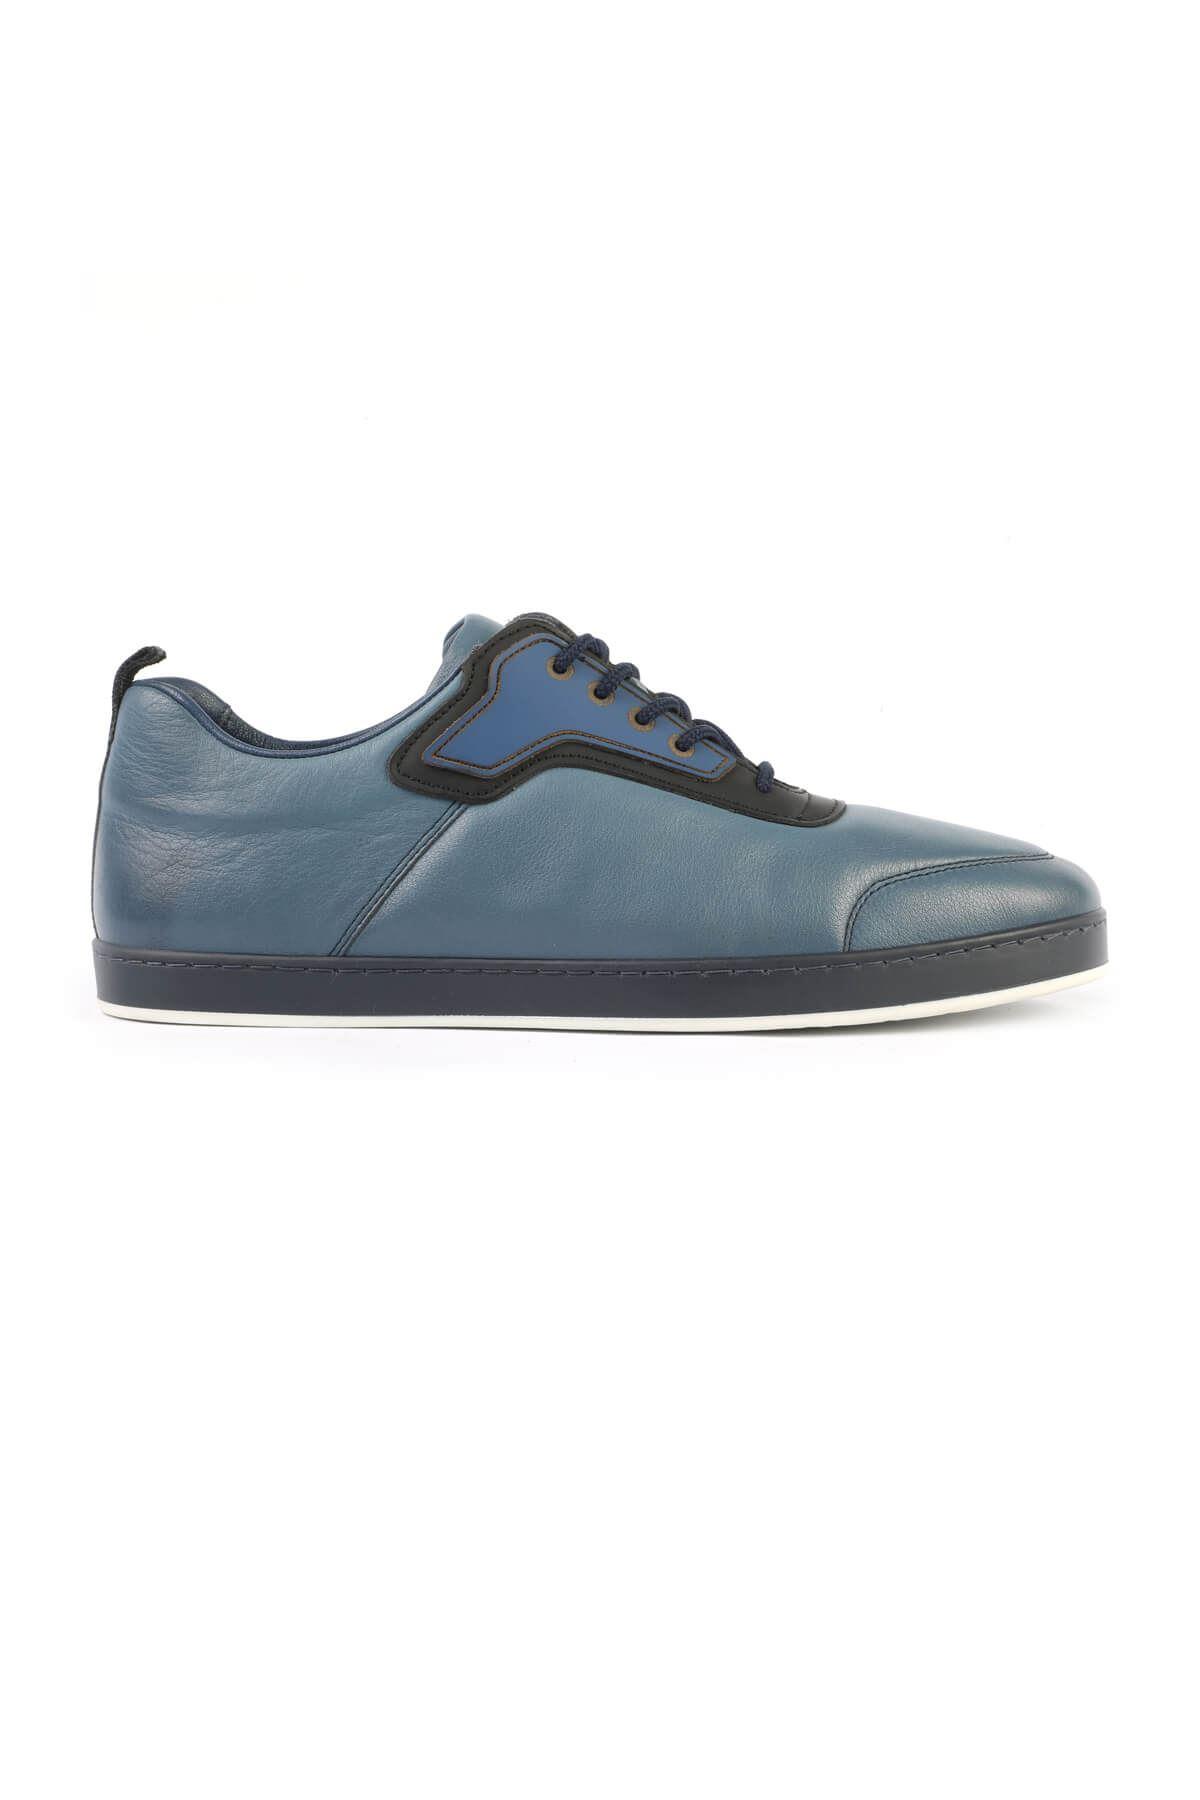 Libero 3105 Blue Sneaker Shoes